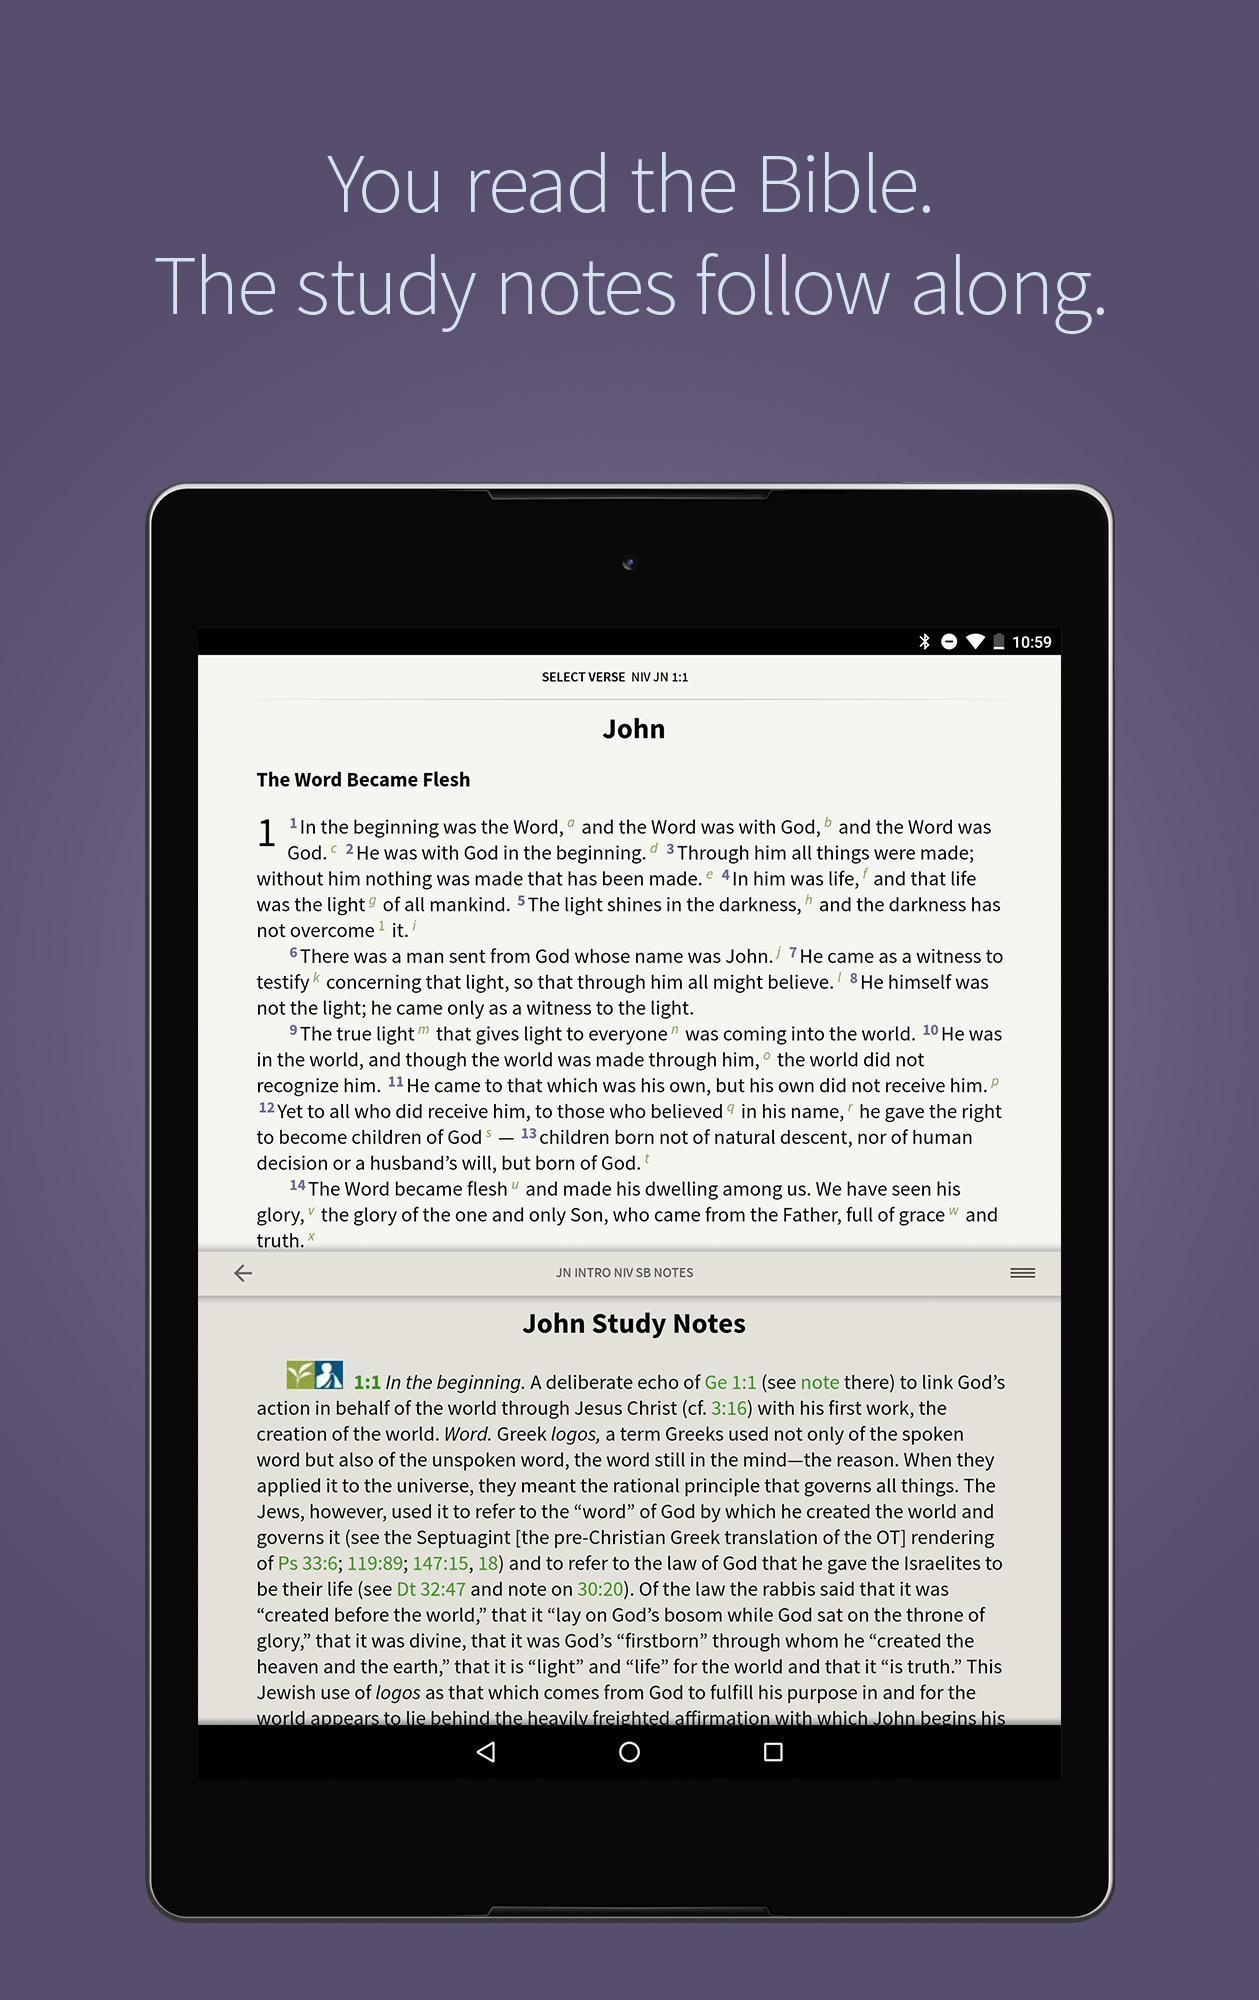 Bible App by Olive Tree 7.5.4.0.5664 Screenshot 23